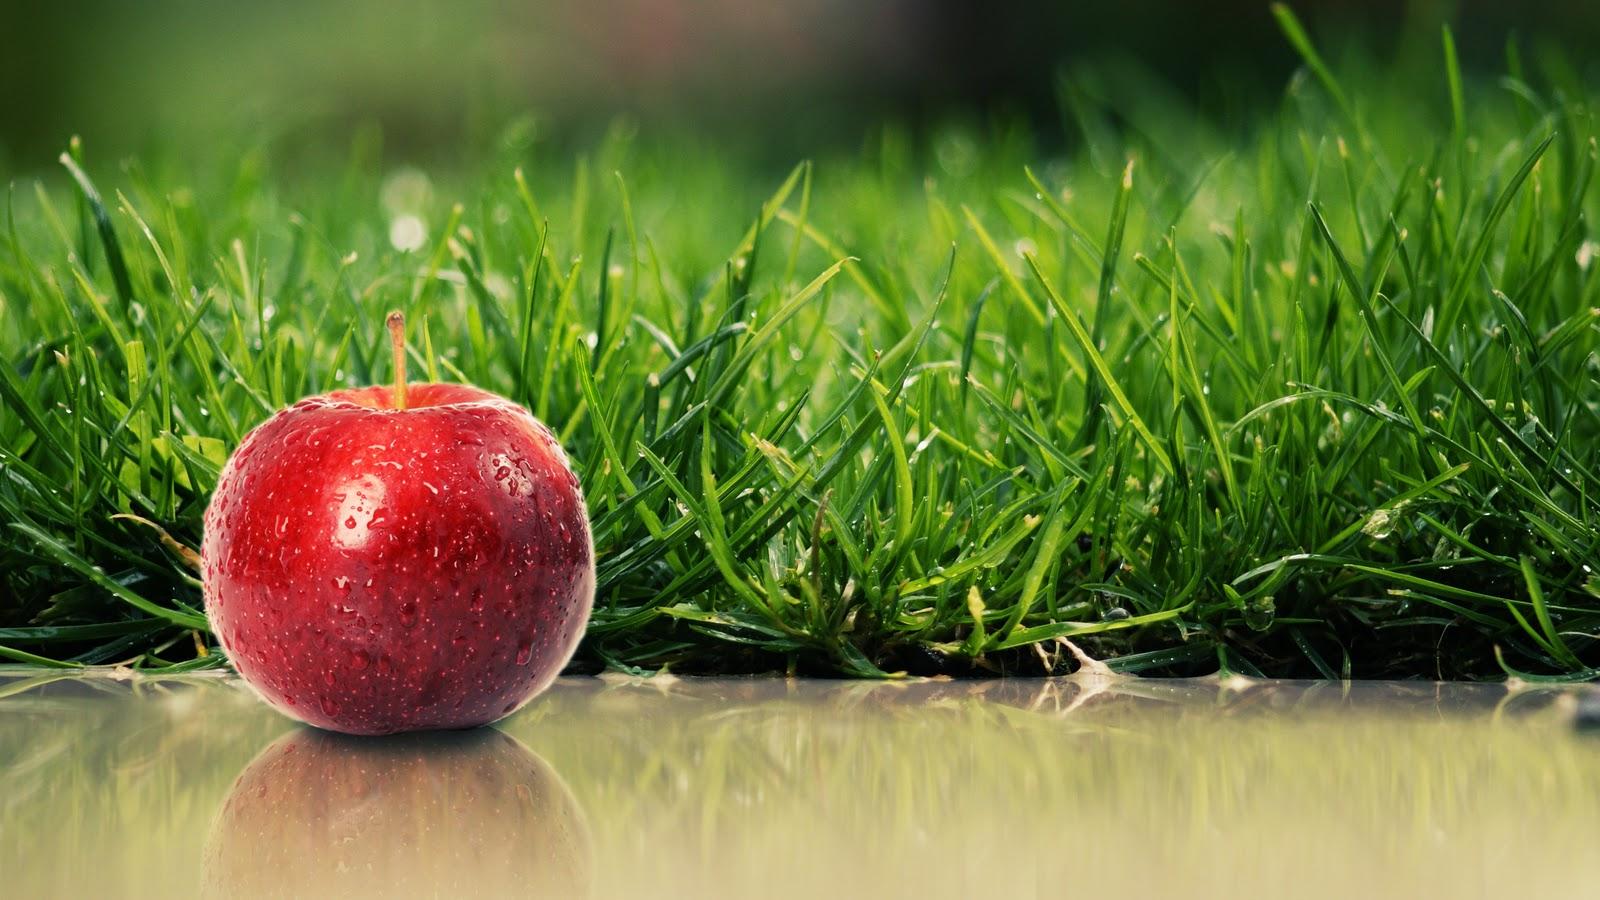 real apple red nature hd wallpaper jpg